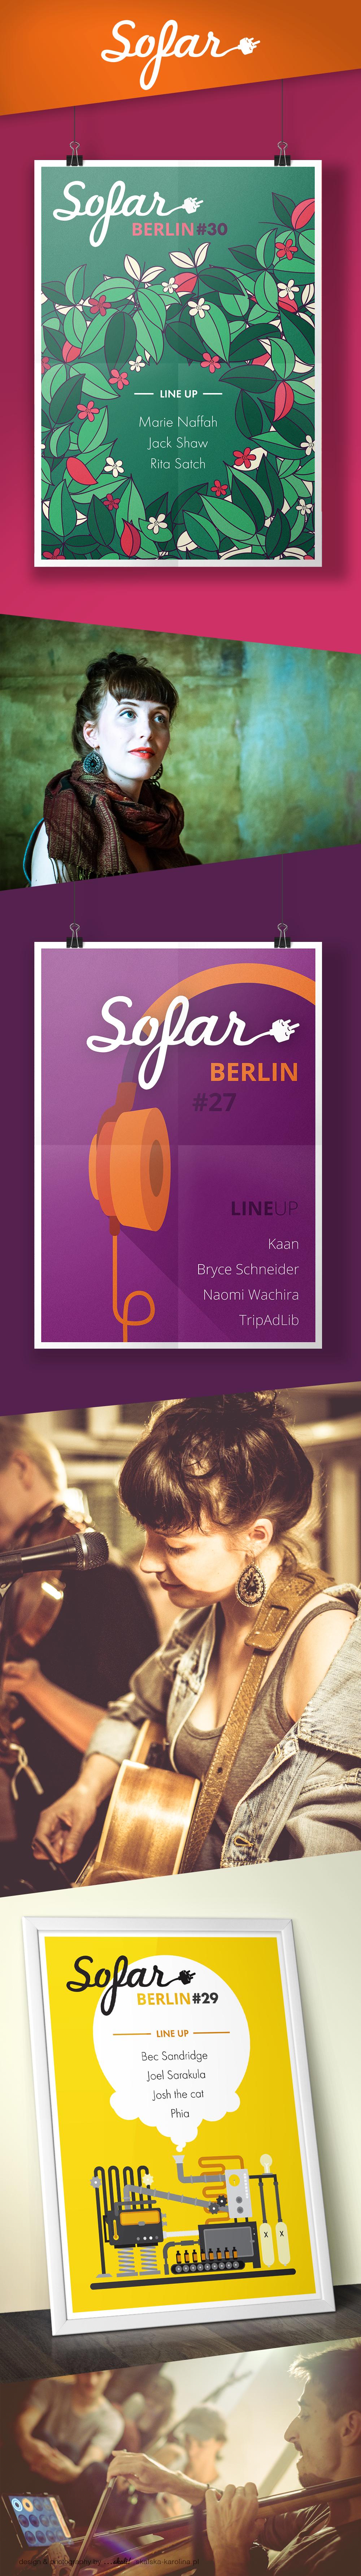 Sofar Berlin posters concerts